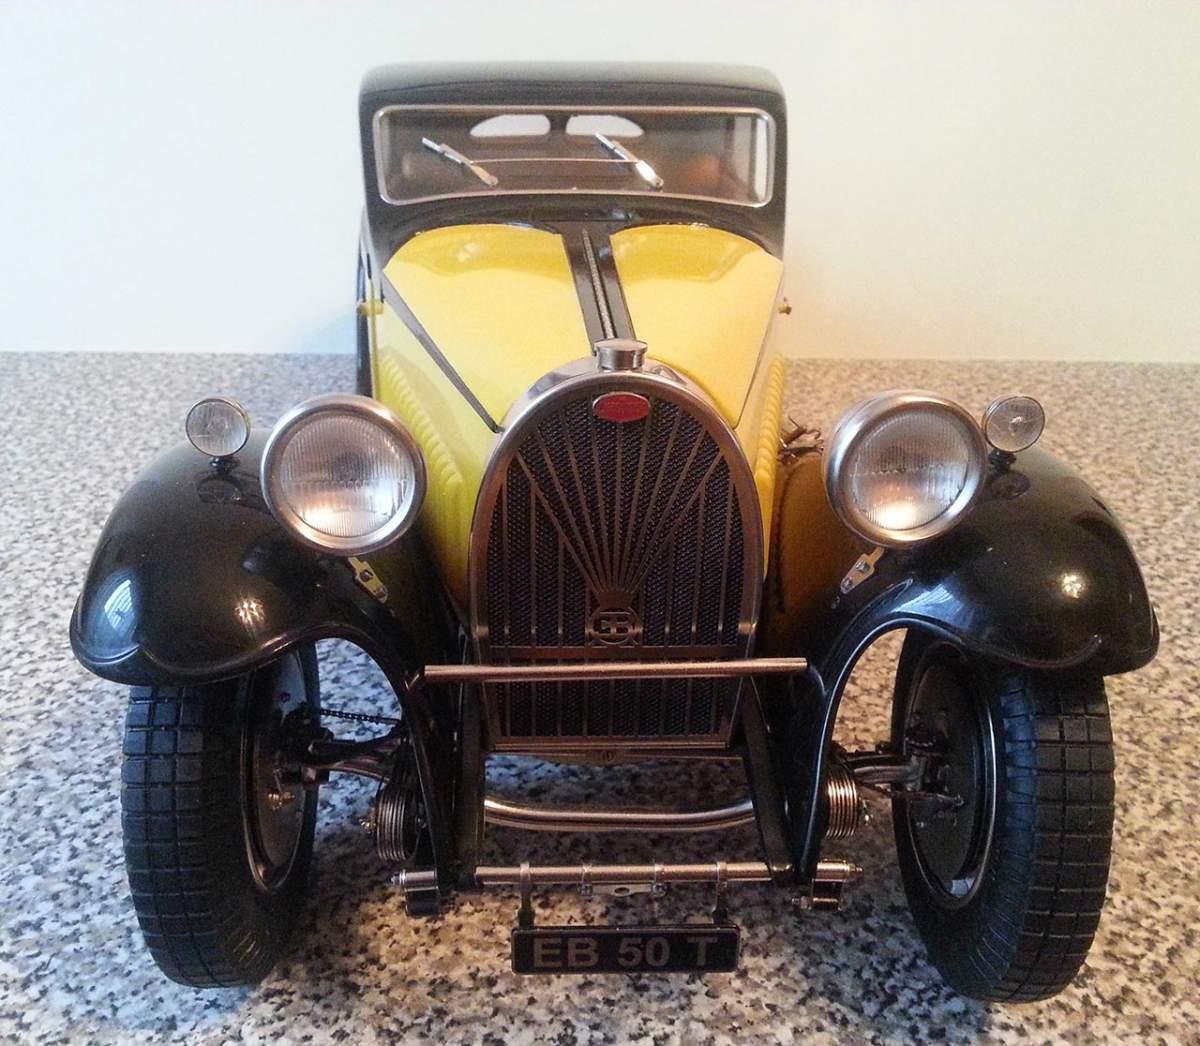 Pocher bugatti 50t surprofile 1932  1/8-wp_20171114_013l4auk-jpg